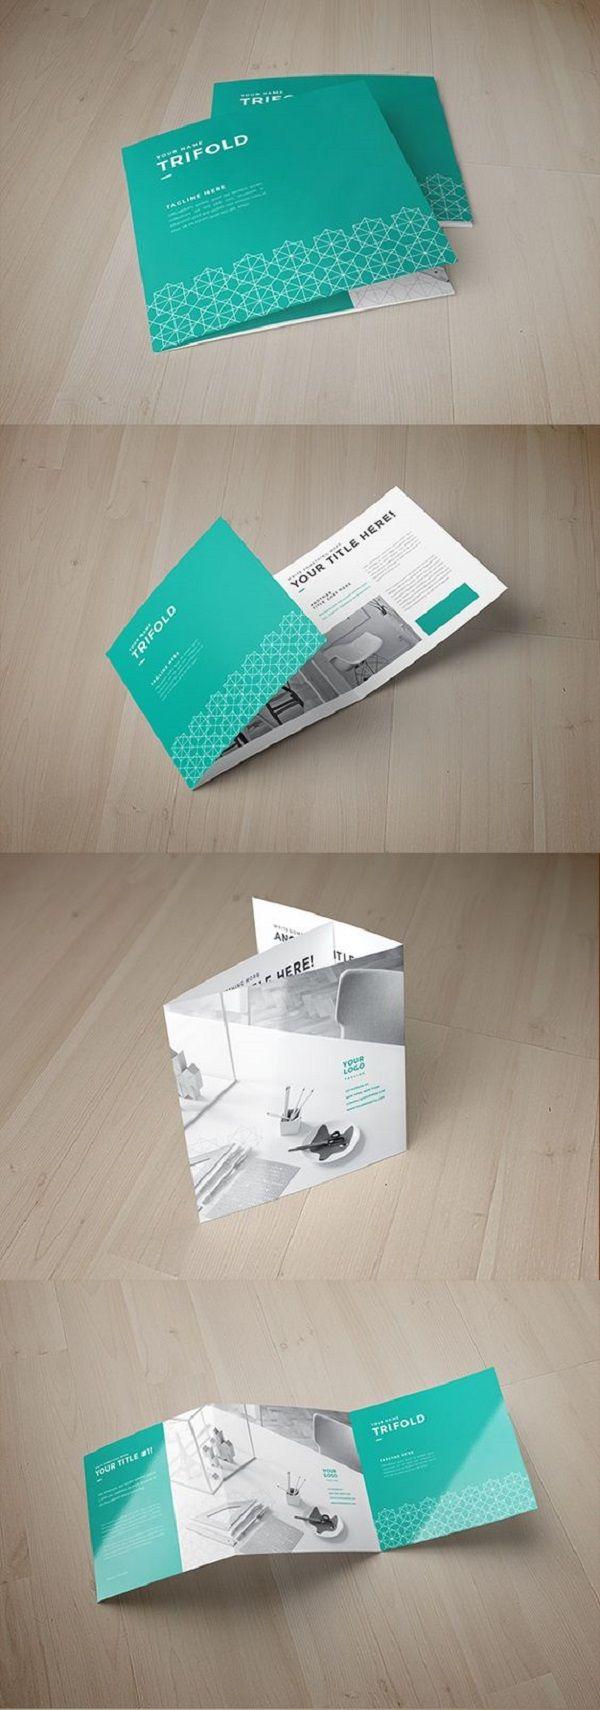 #CreativeBrochure #CorporateBrochure #BrochureDesigns